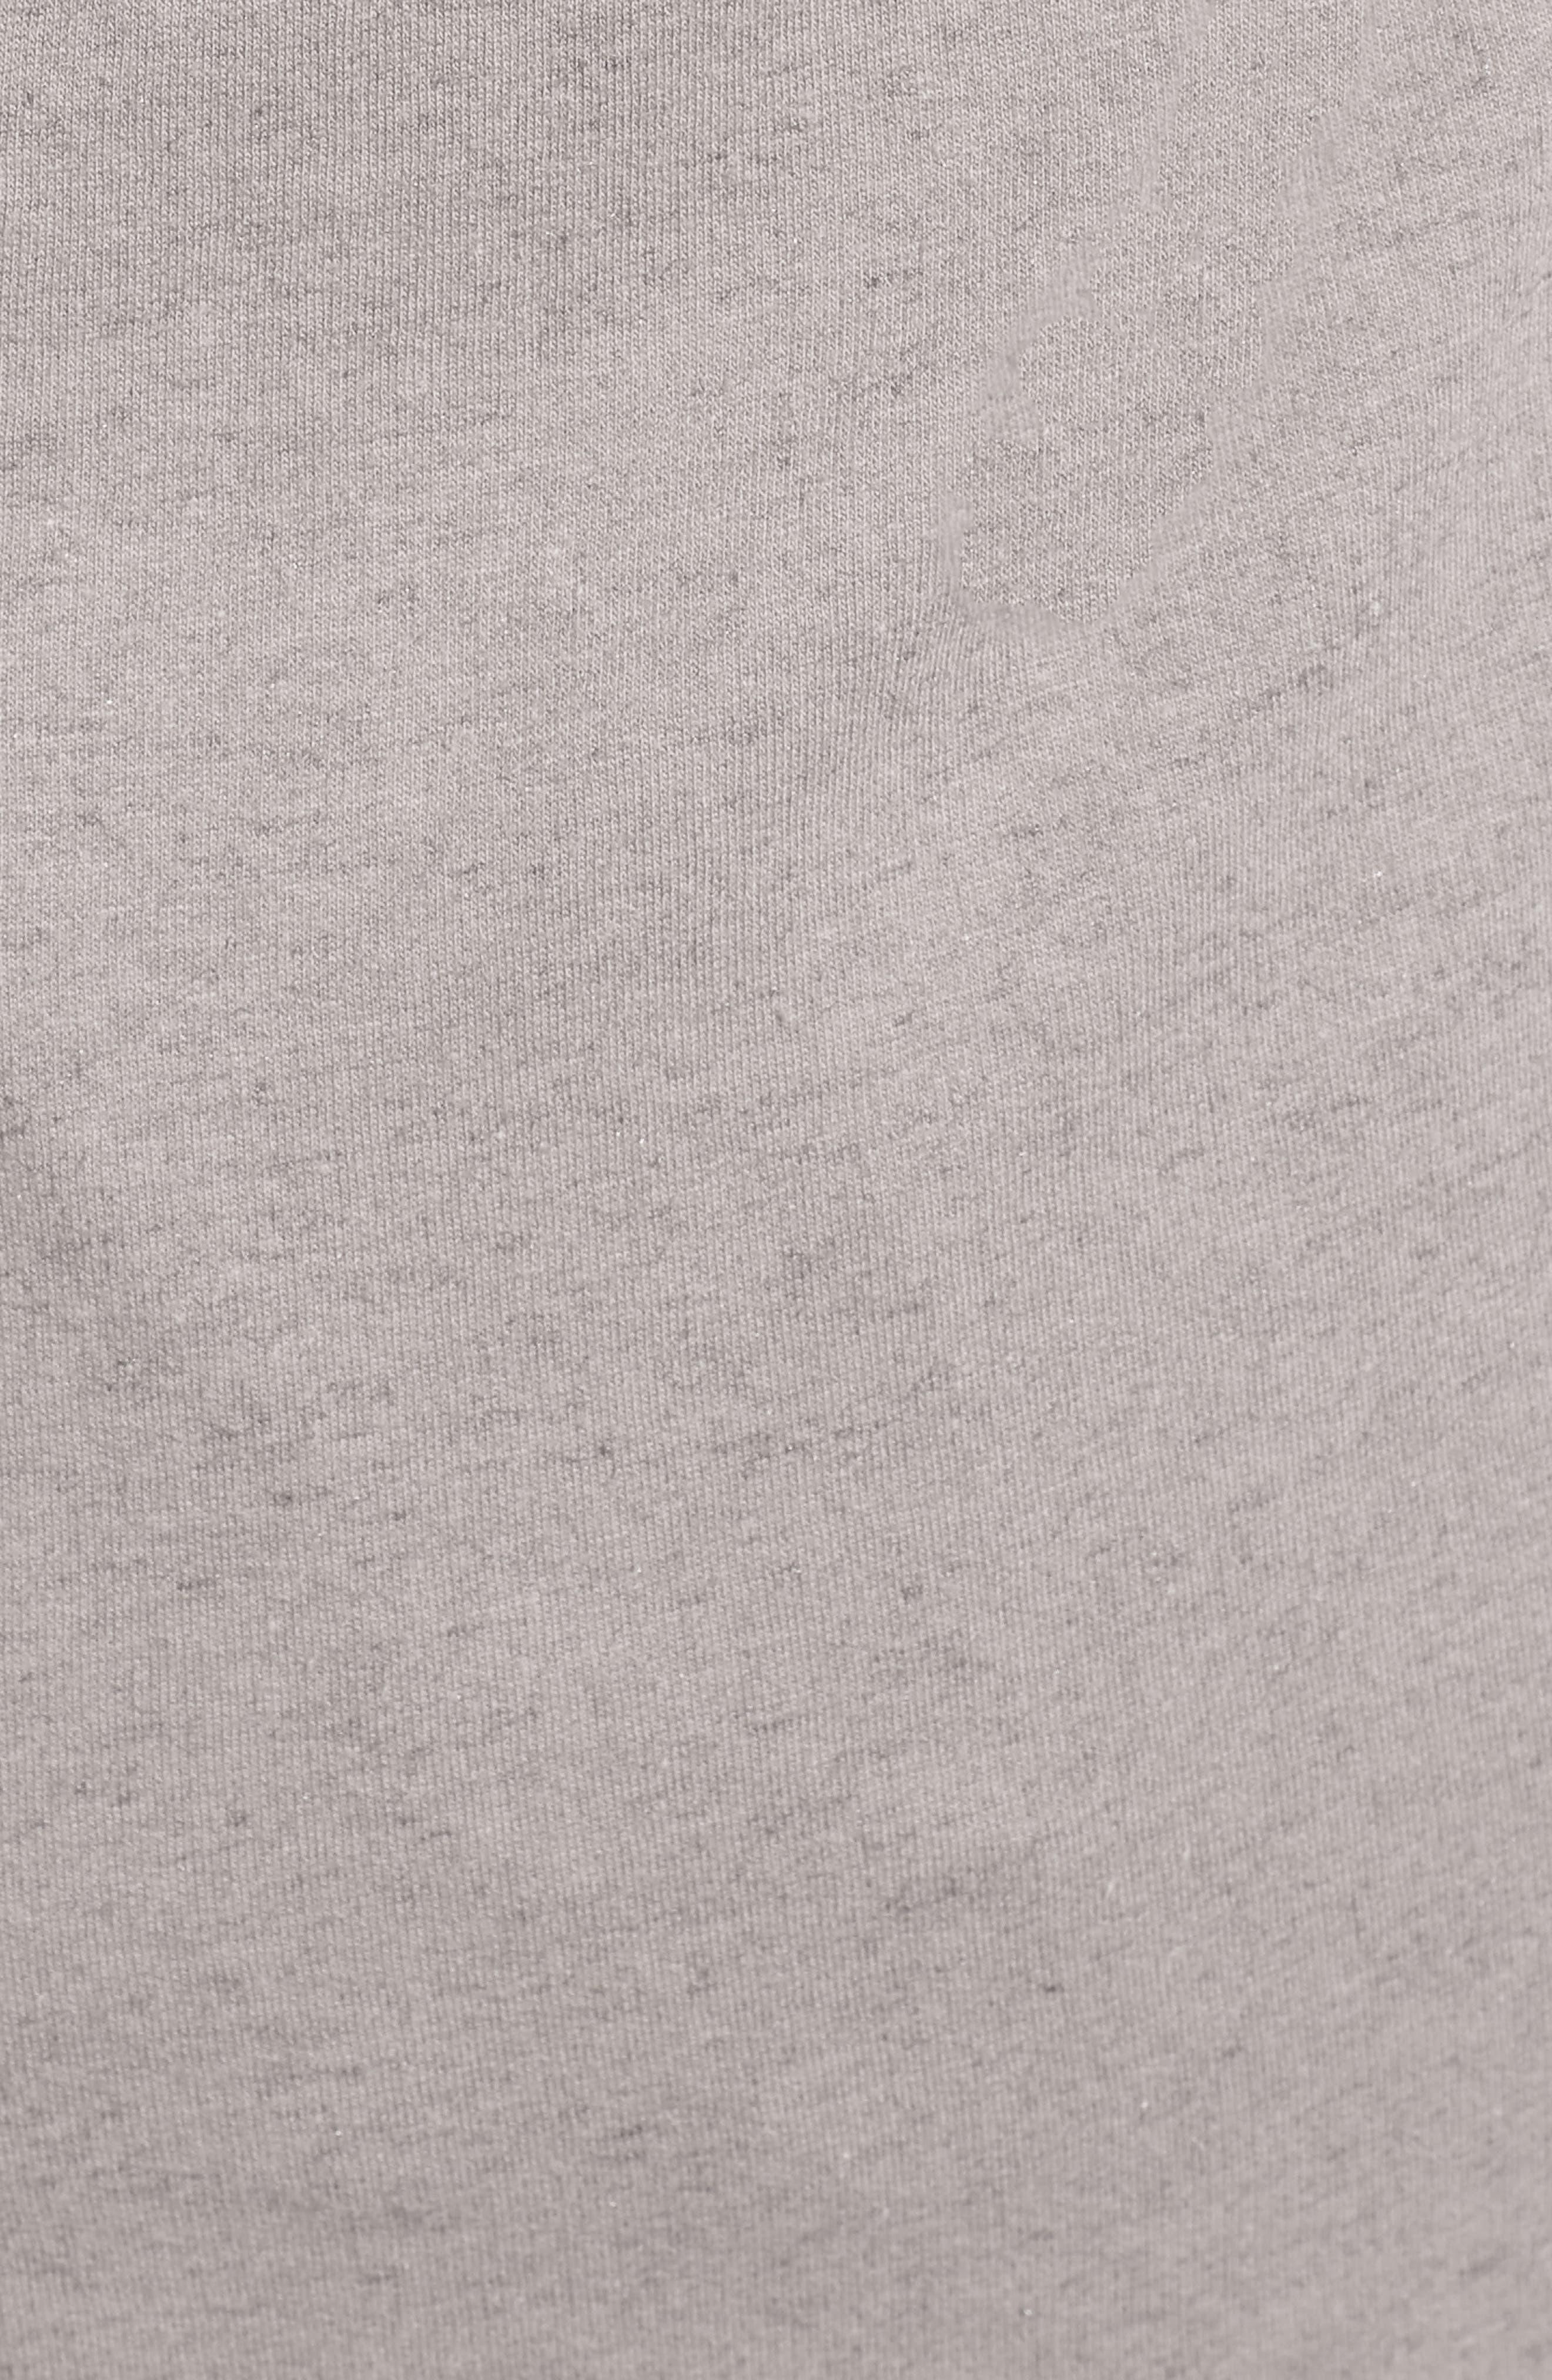 Stella Knit Jacket,                             Alternate thumbnail 58, color,